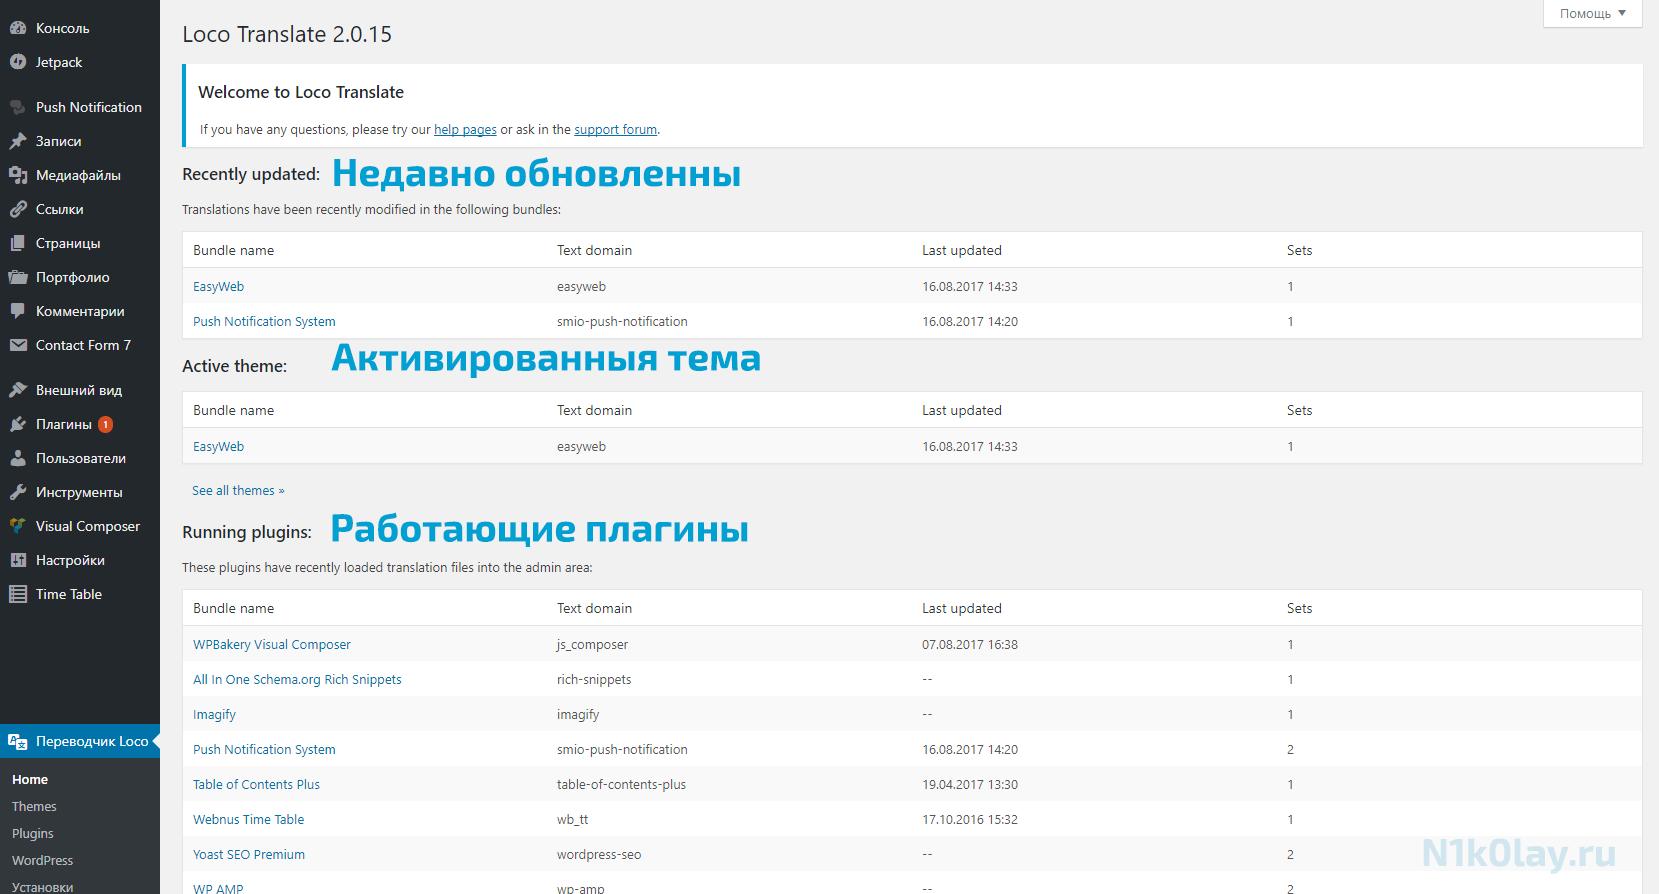 loco translate страница настройки плагина, перевод темы и плагина WordPress